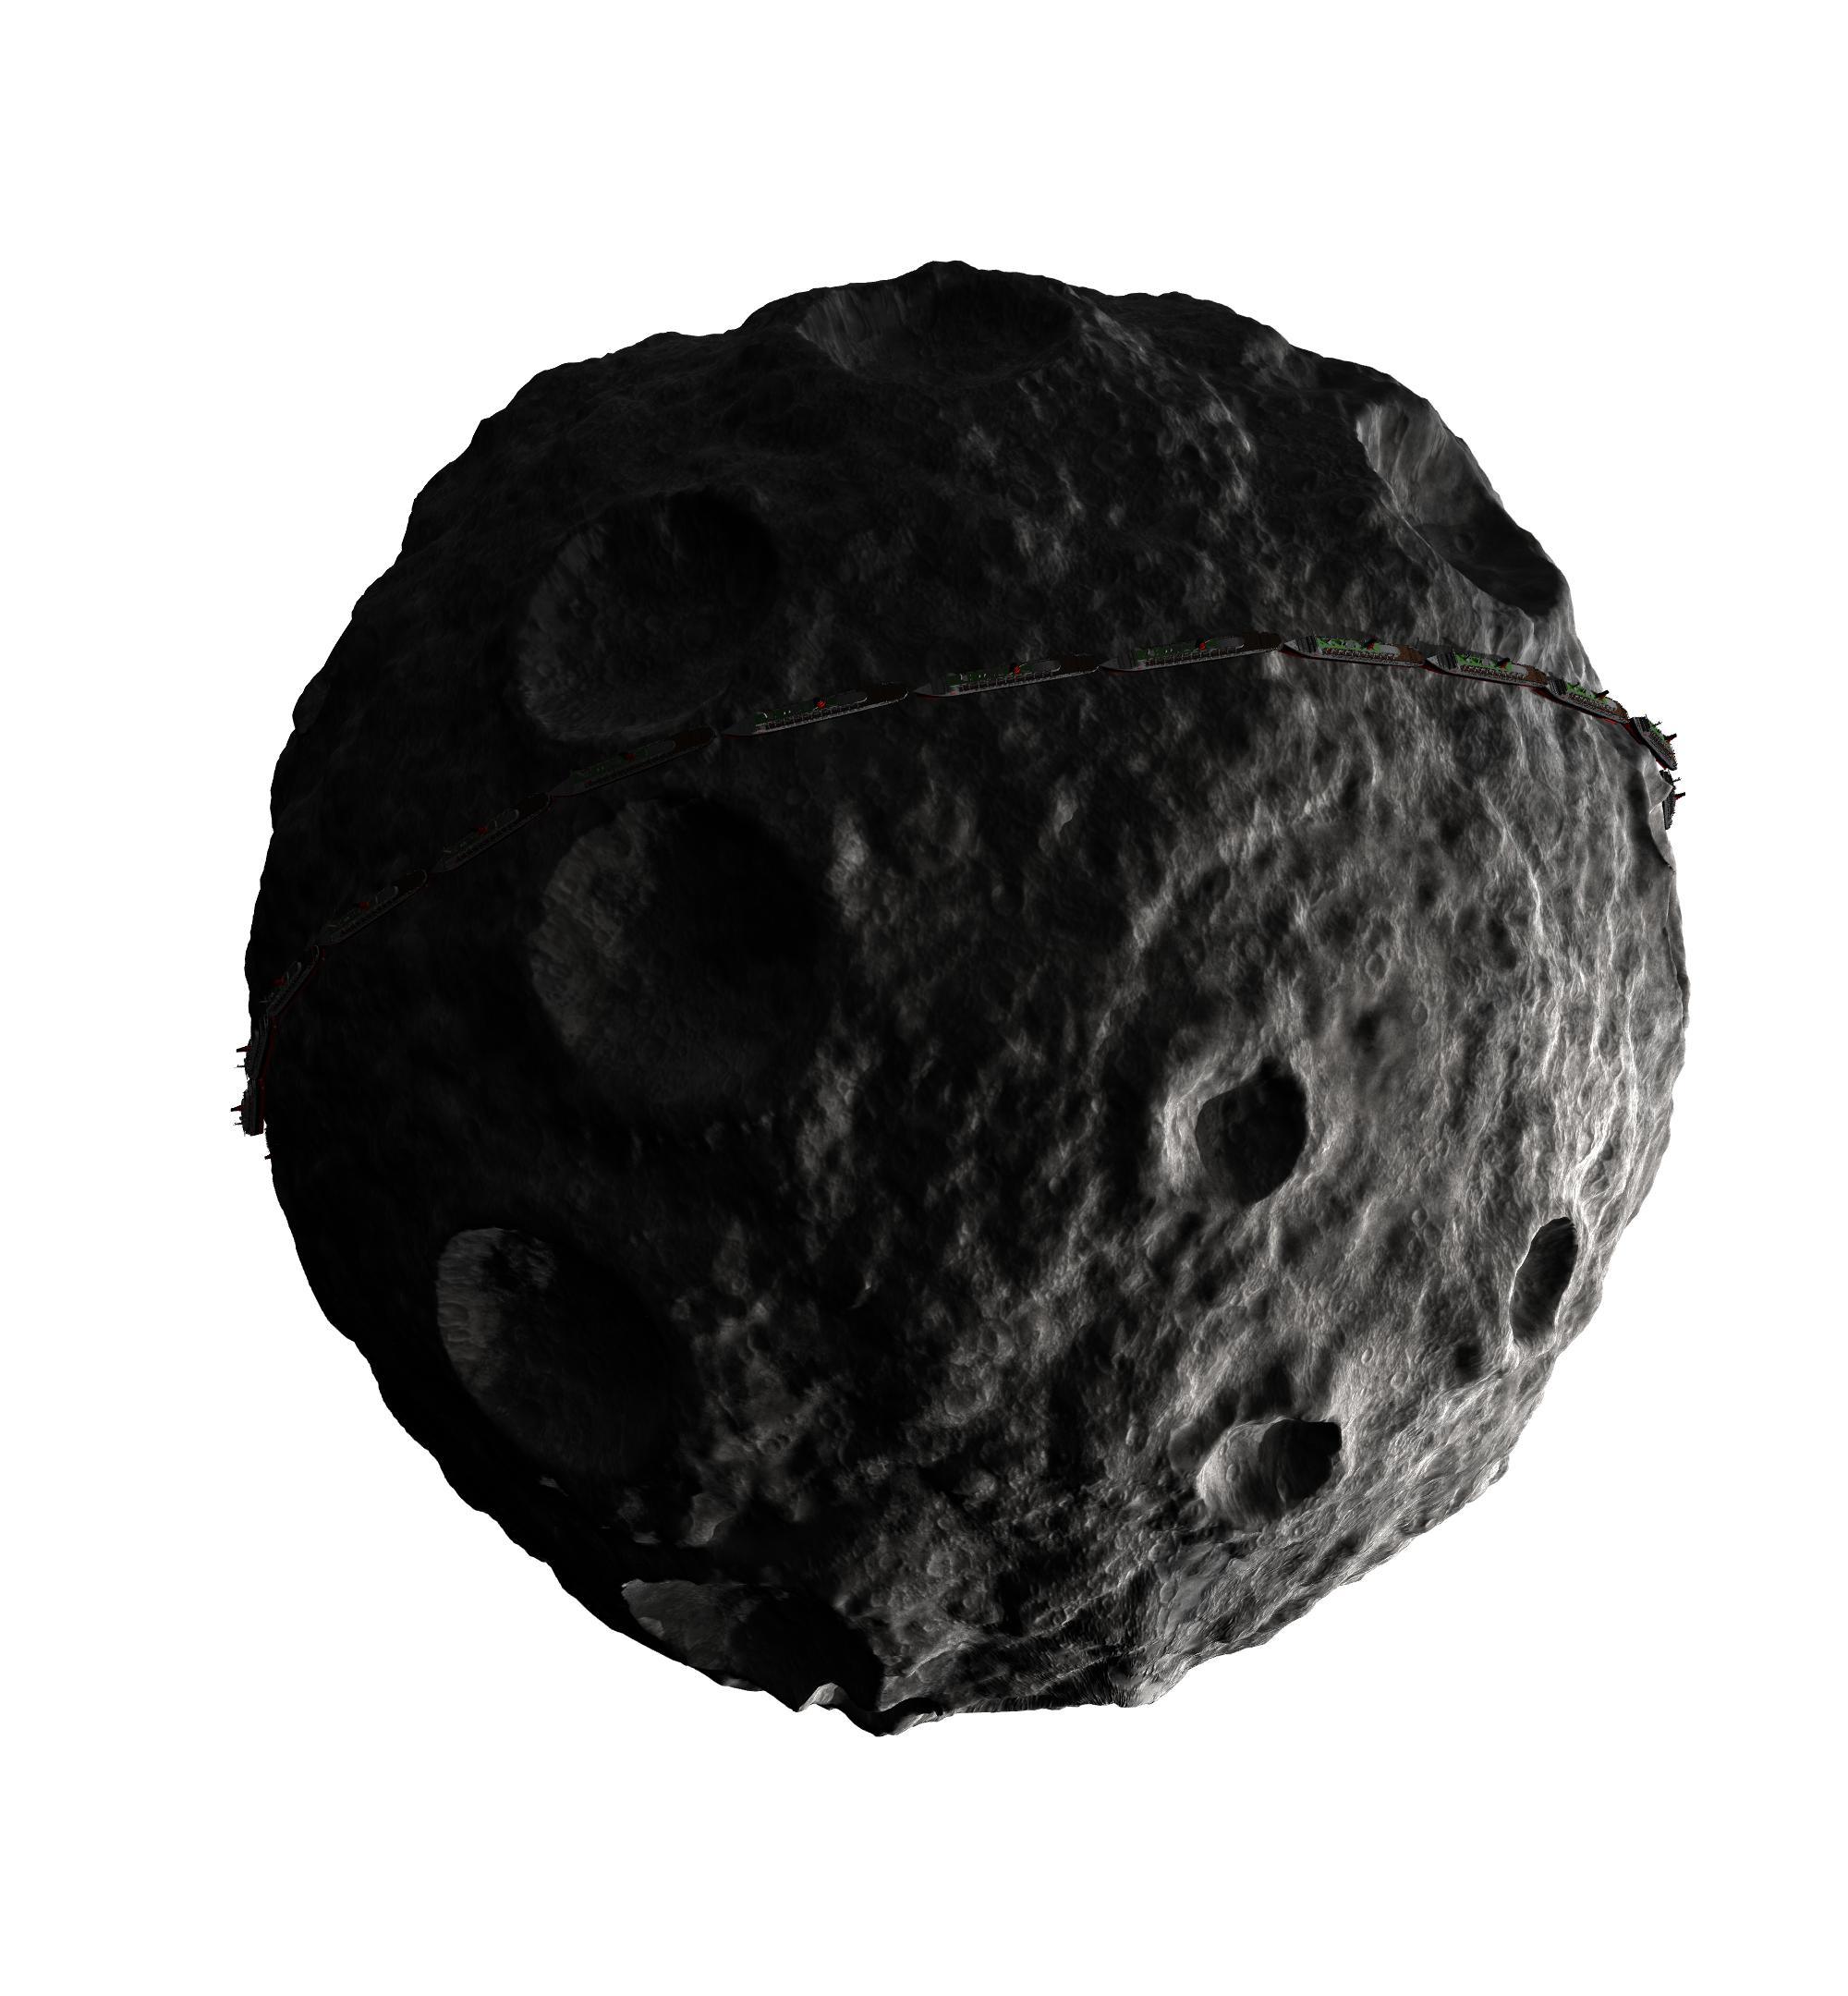 Download Asteroid Transparent HQ PNG Image | FreePNGImg